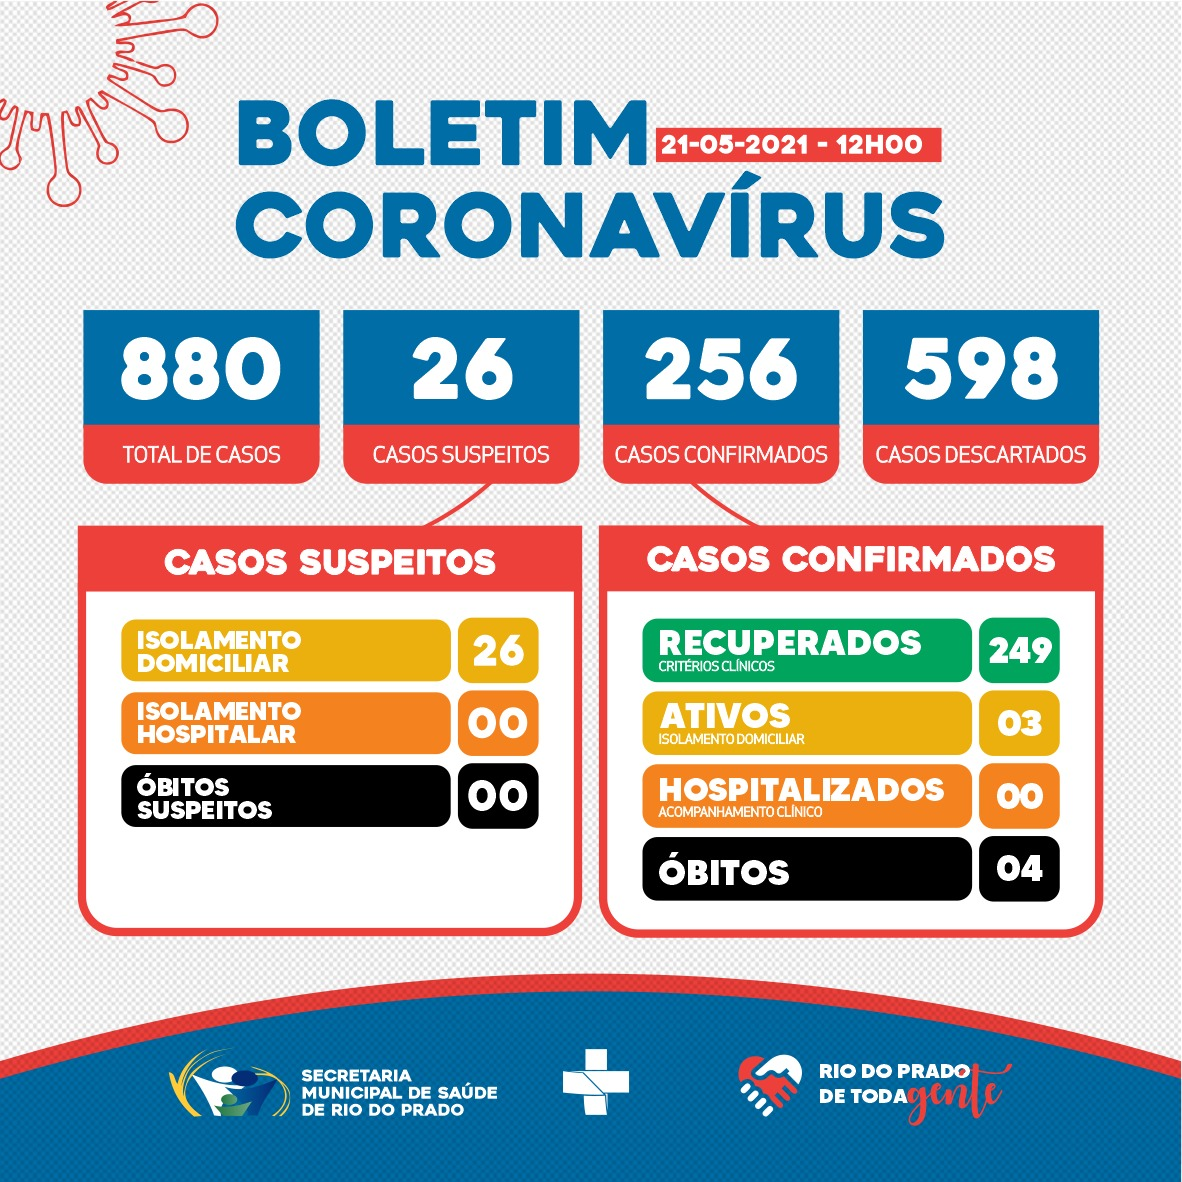 BOLETIM EPIDEMIOLÓGICO CORONAVÍRUS - 21/05/2021